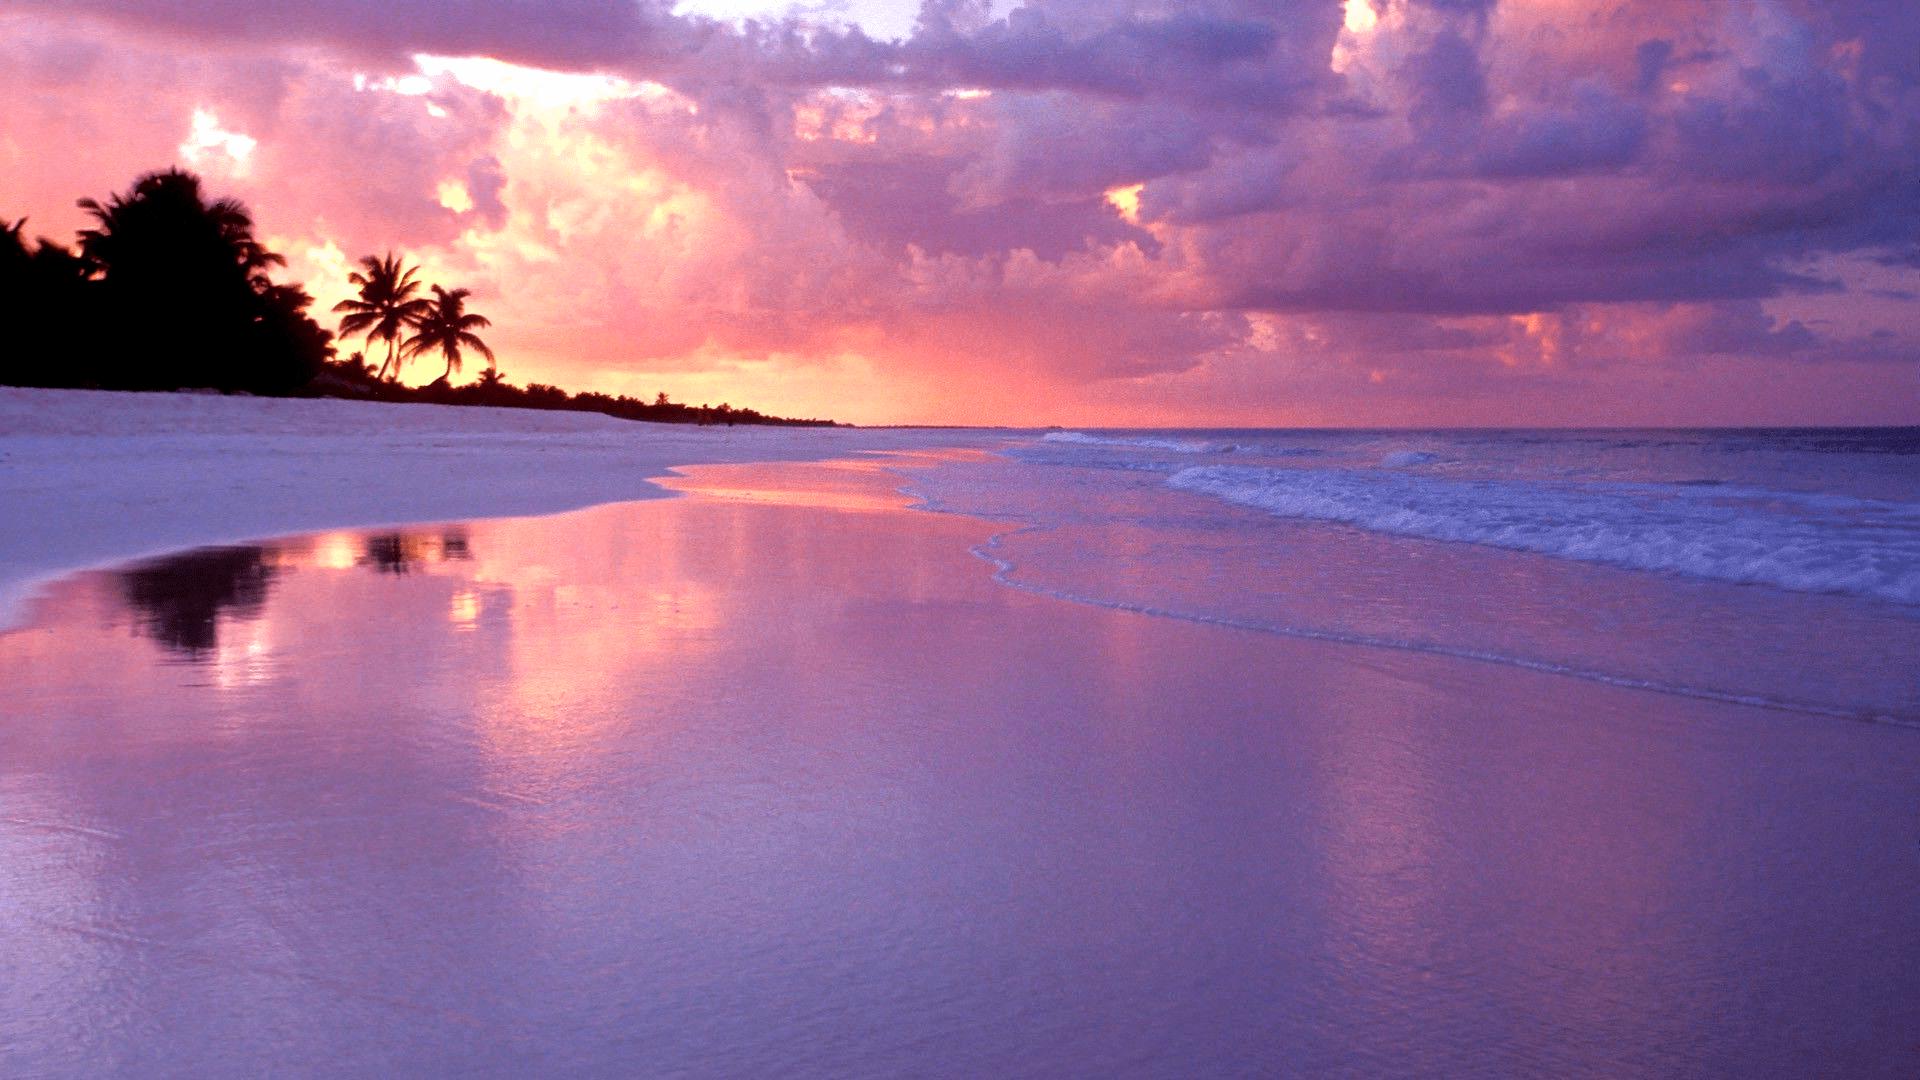 1920x1080 Sunset Wallpapers Top Free 1920x1080 Sunset Backgrounds Wallpaperaccess